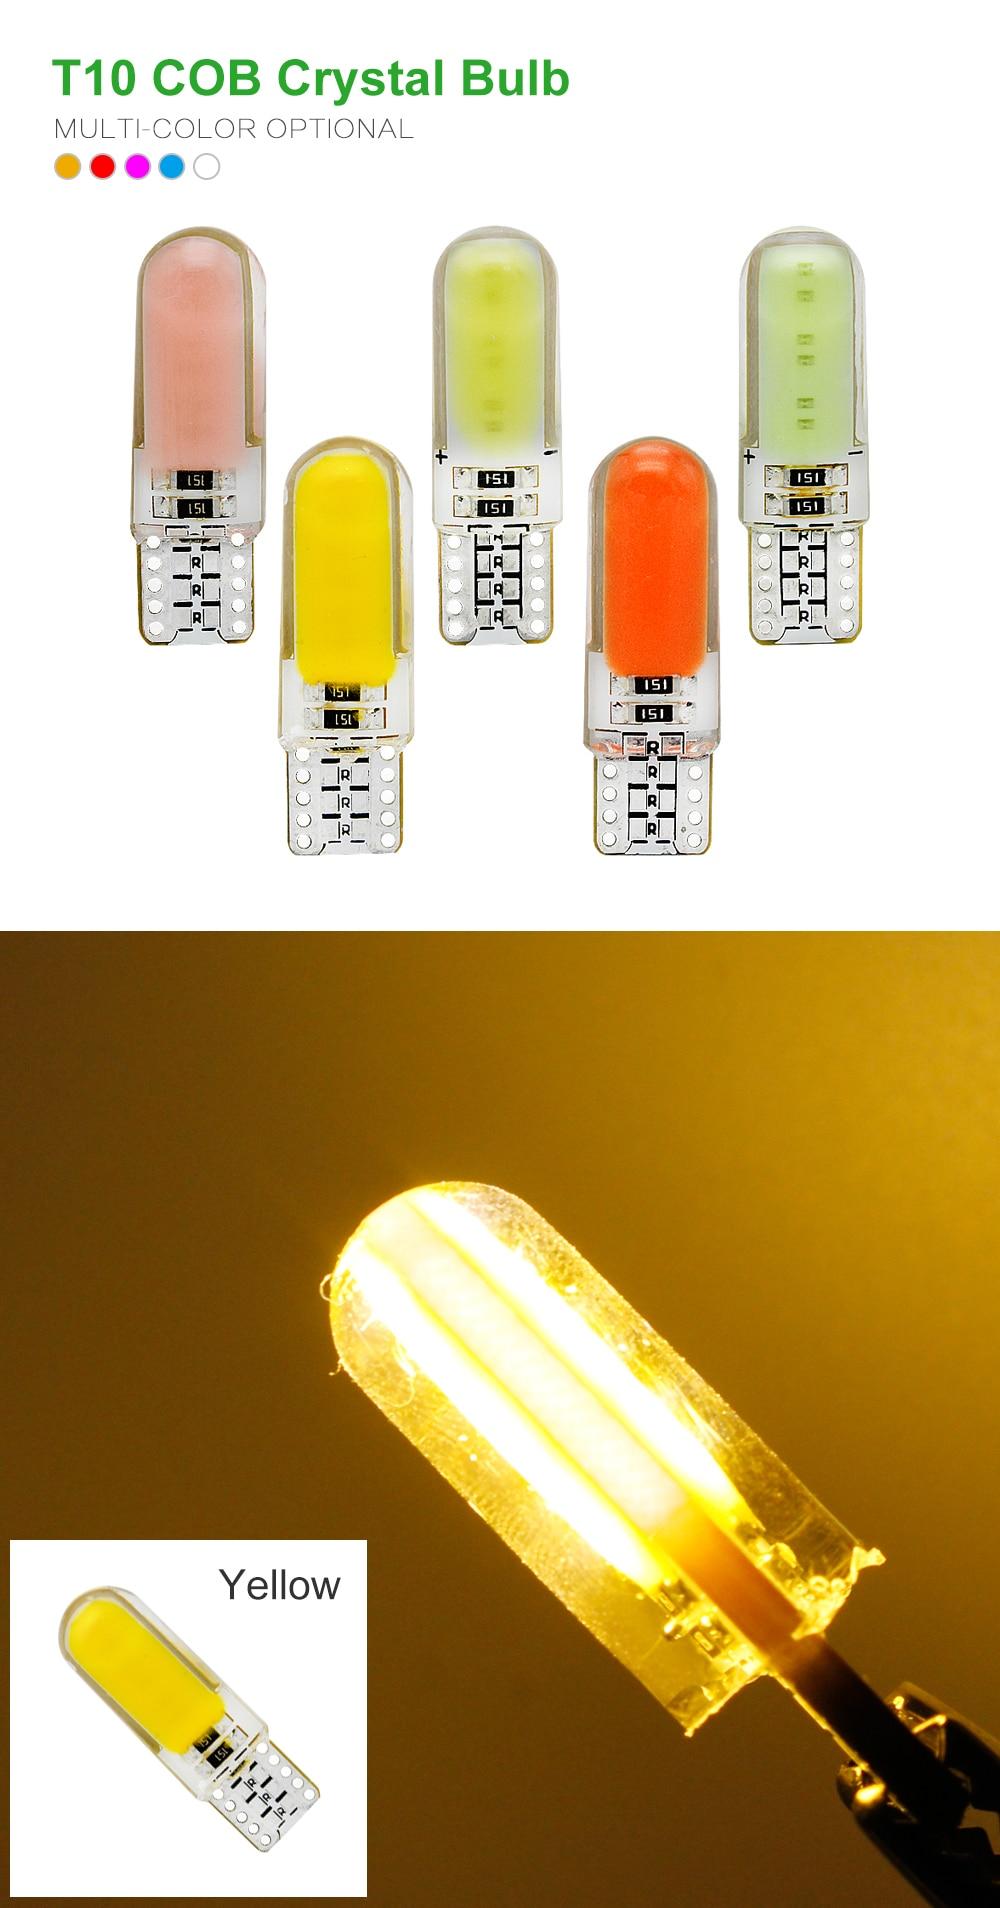 ANBLUB Silicone LED Car Interior Light 12V T10 W5W Wedge Side Parking Lamp Clearance Light COB LED Auto Reading Bulb Signal Lamp